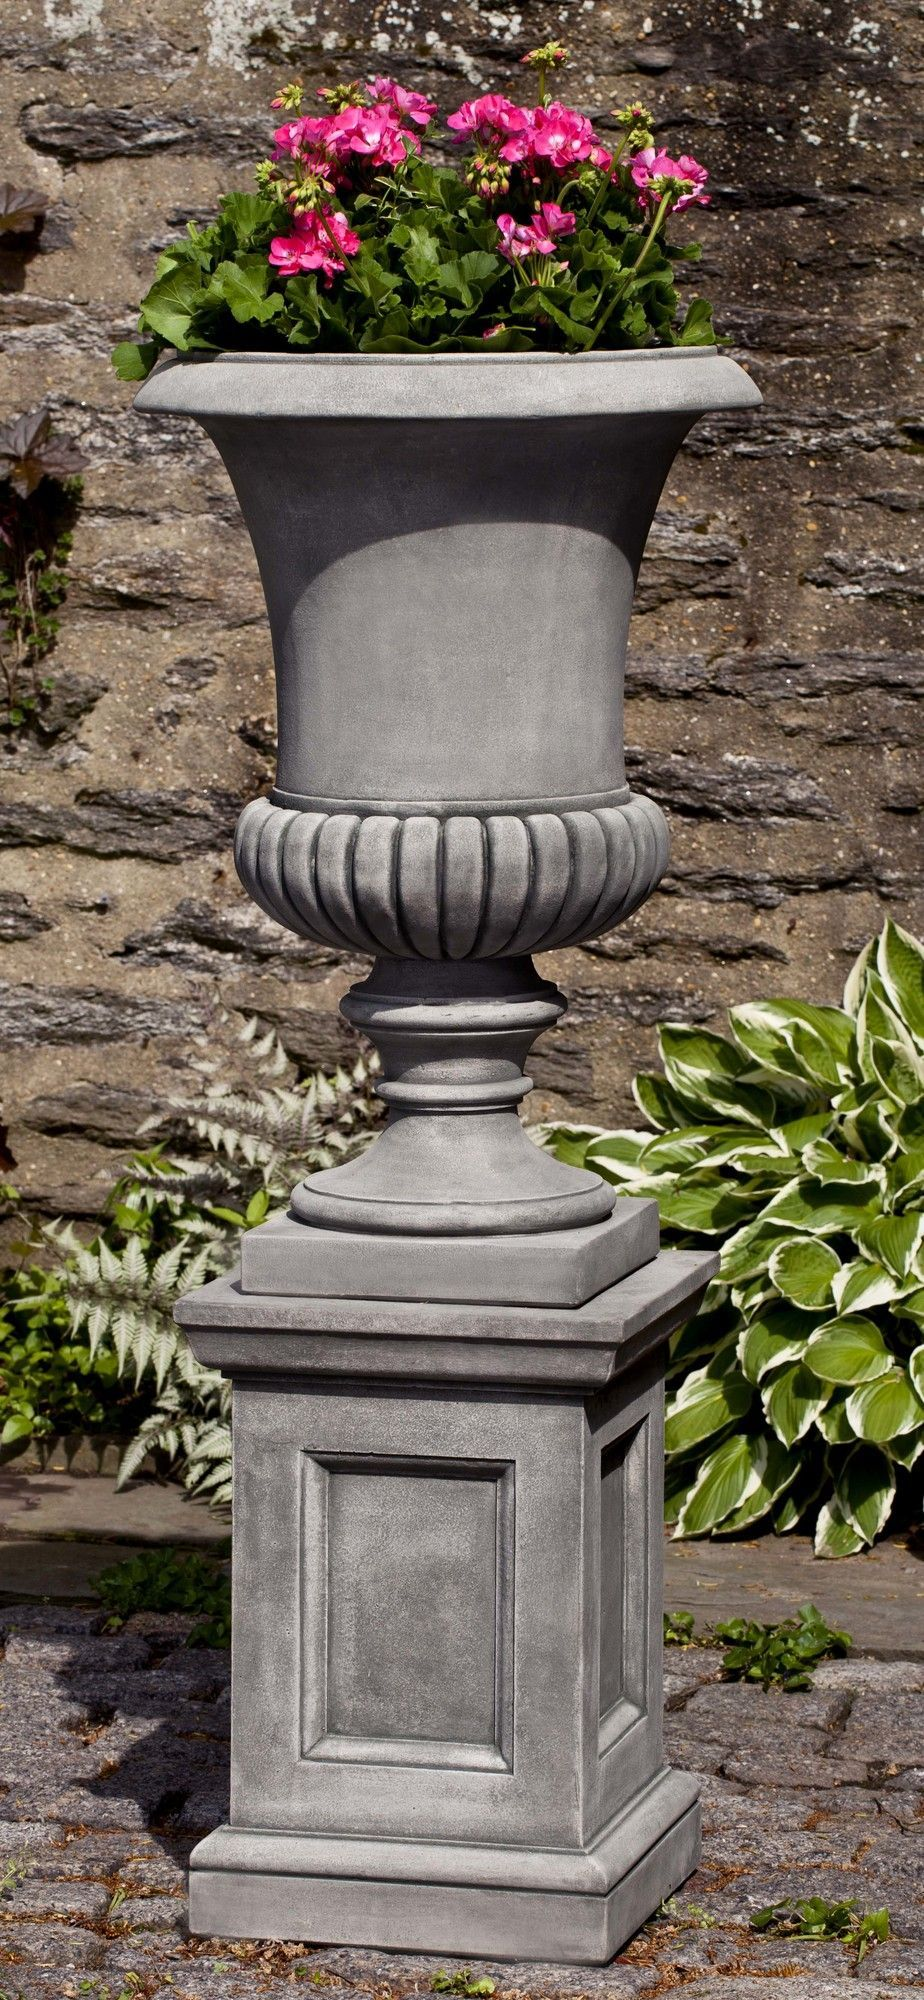 Novelty Pedestal Planter Urn Planters Garden Urns Outdoor Urns